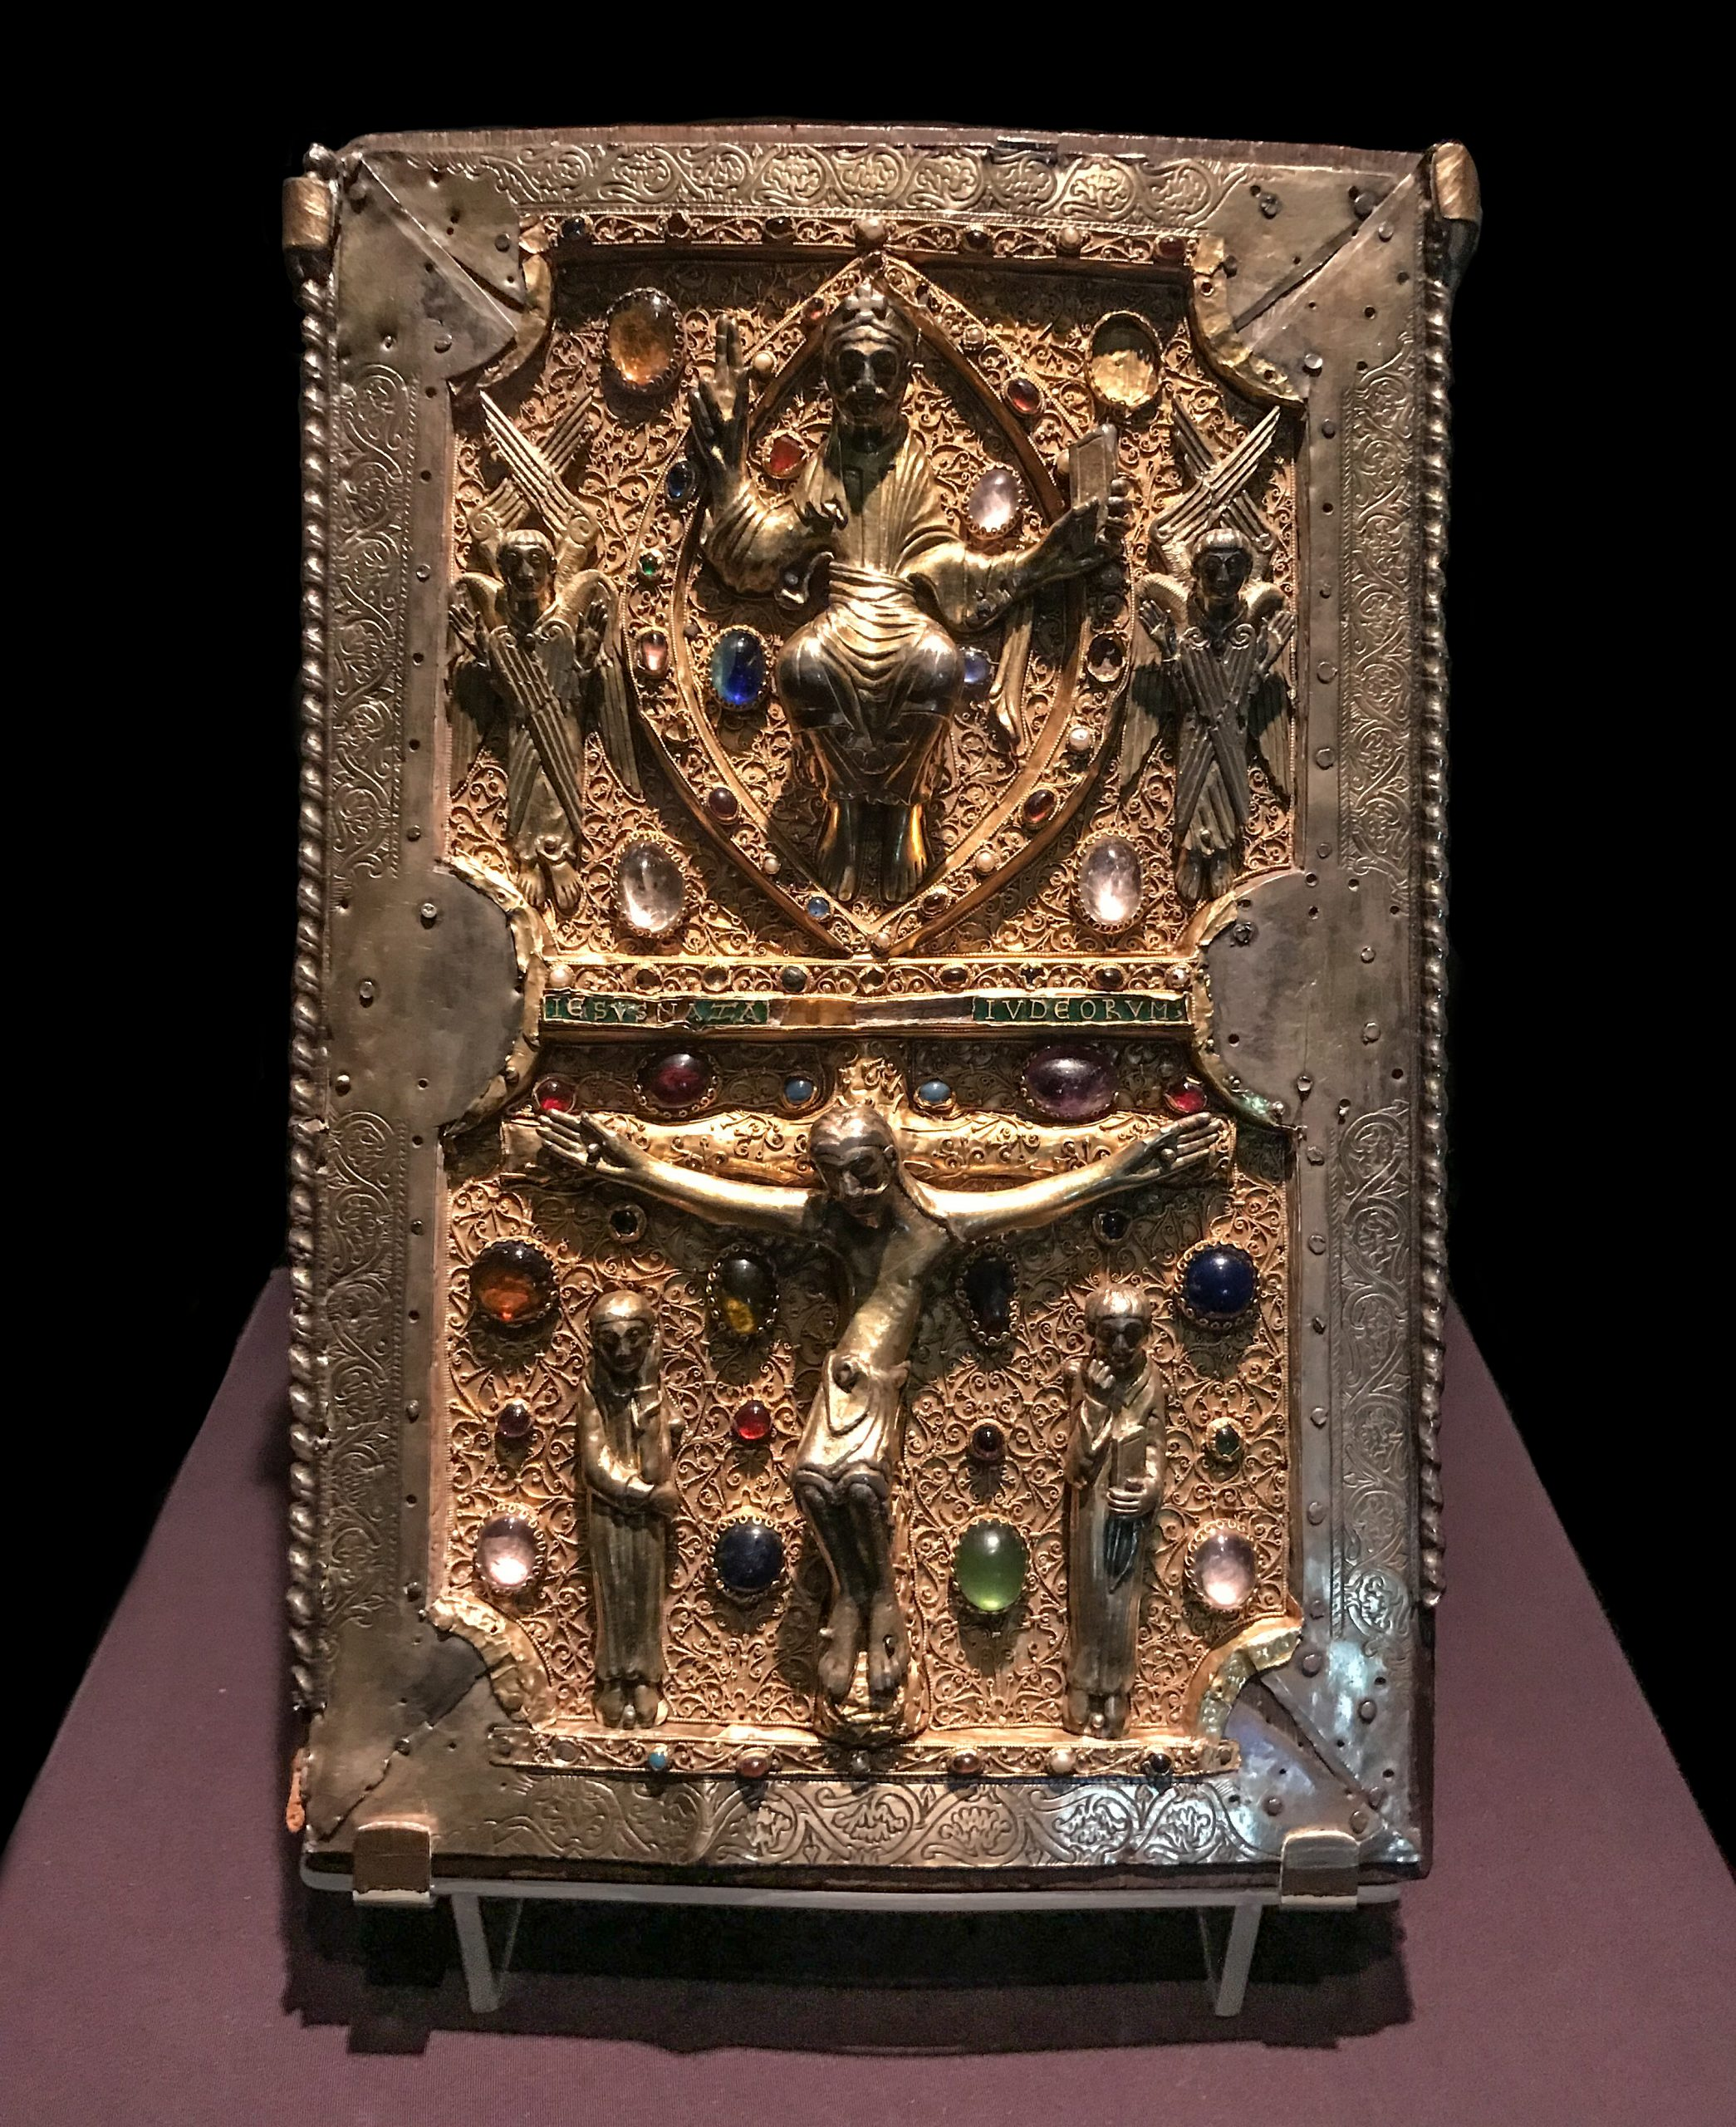 The Judith of Flanders Gospels